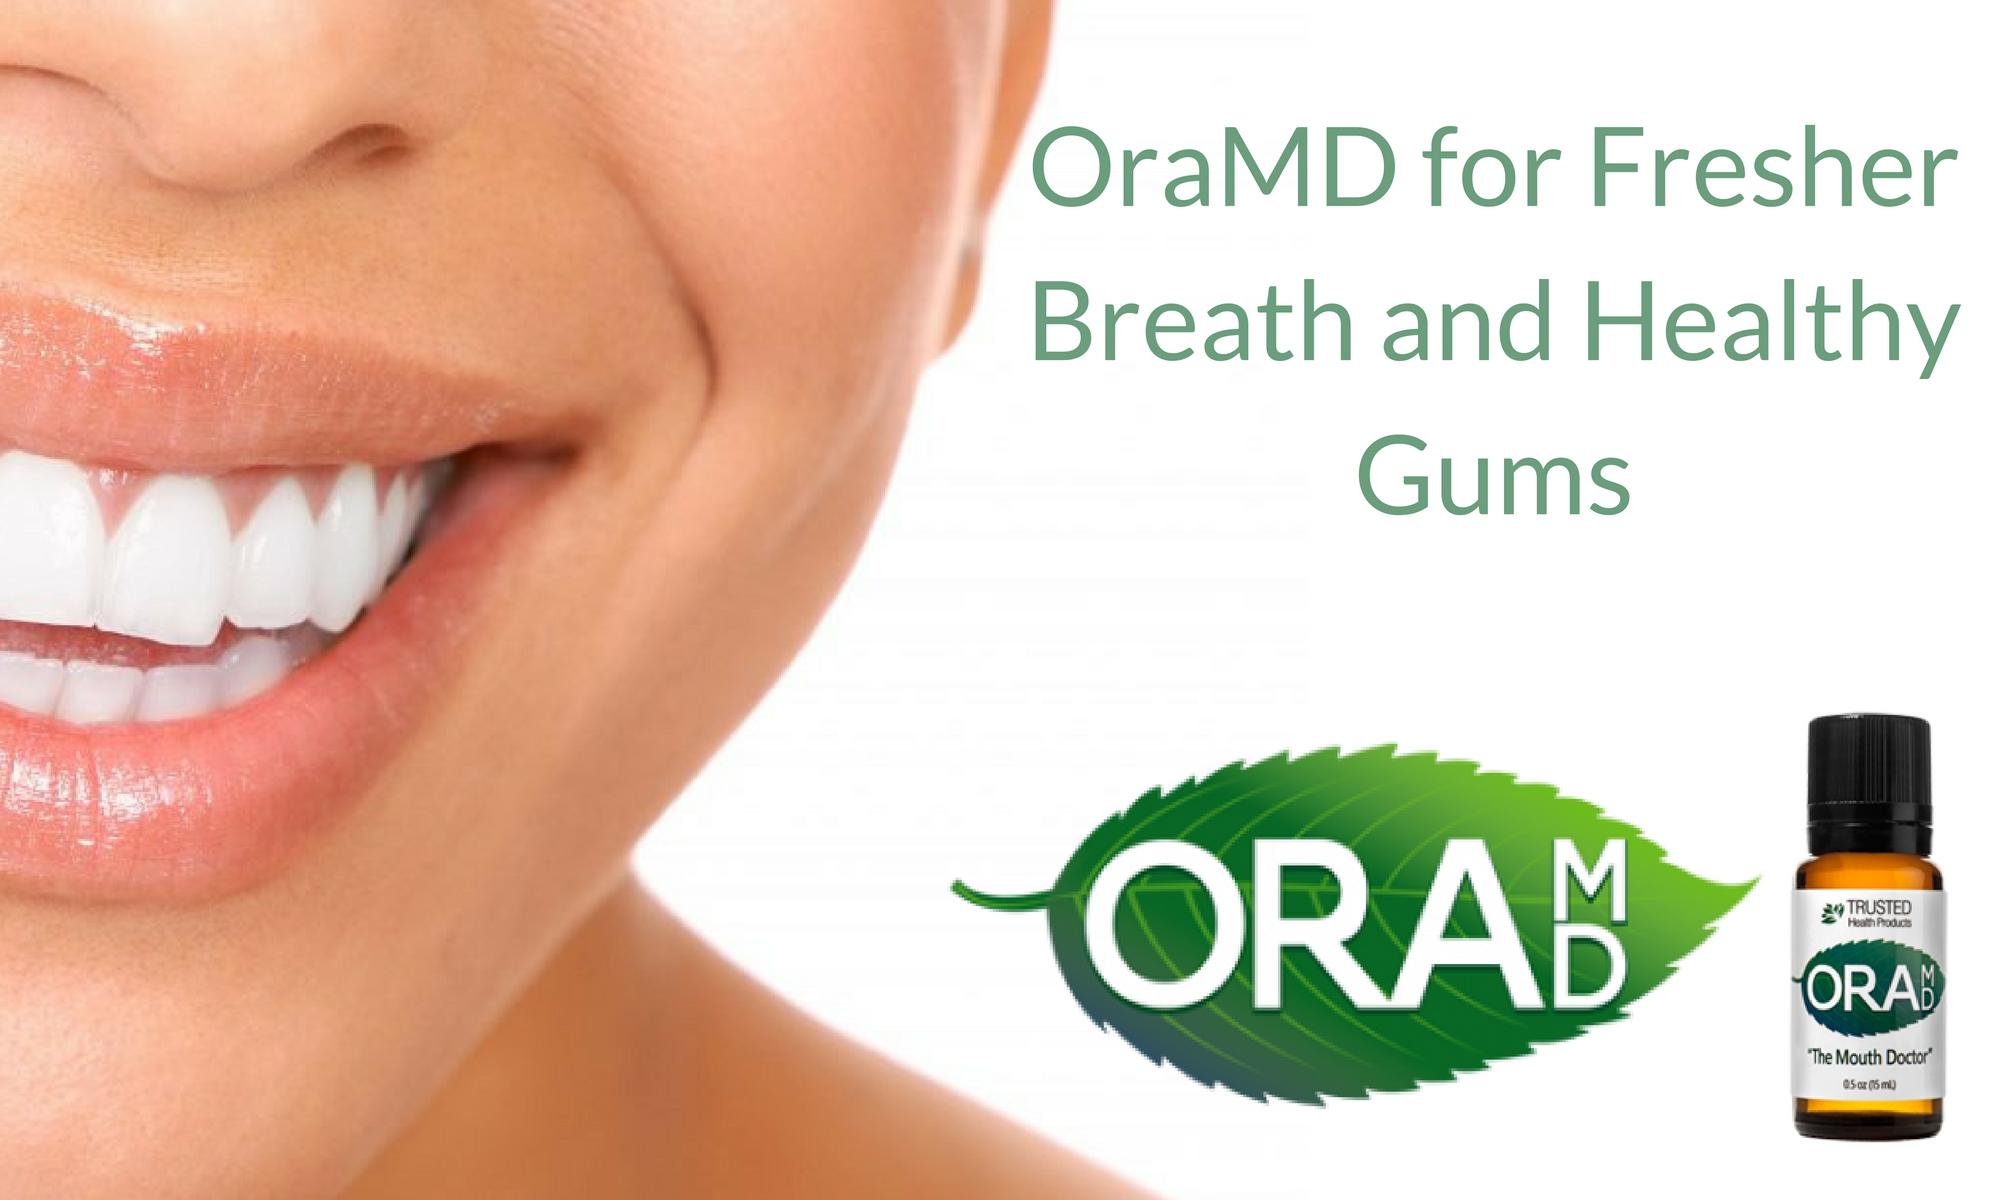 Press Release OraMD